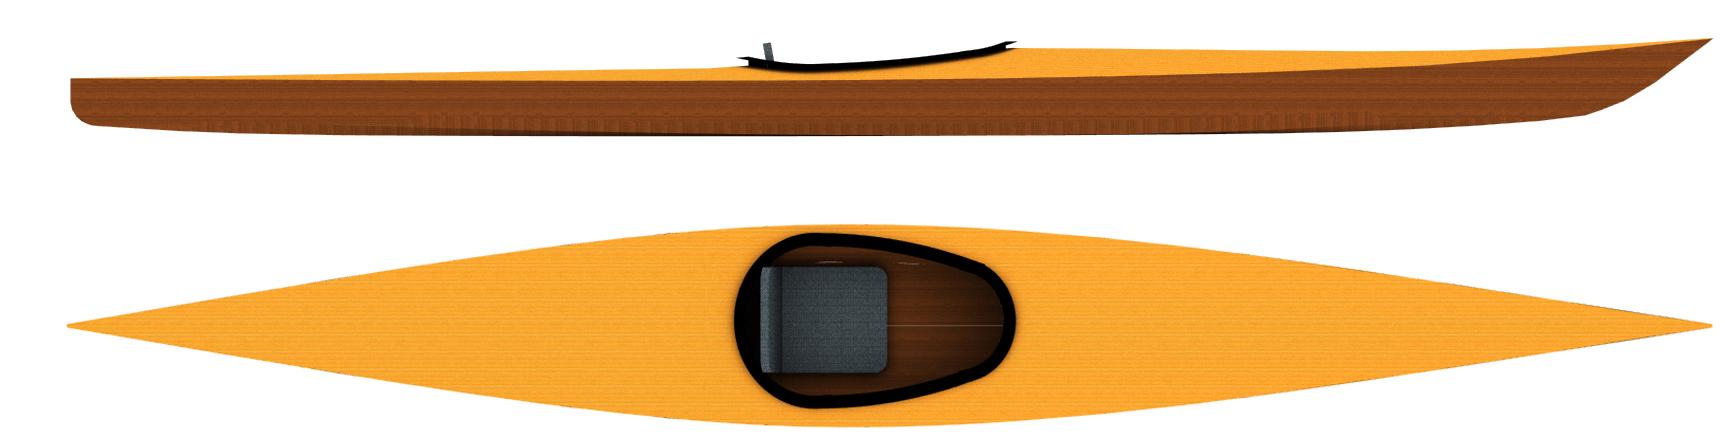 Kayaks: Sport 17 by Otto Vallinga Yacht Design - Image 3397